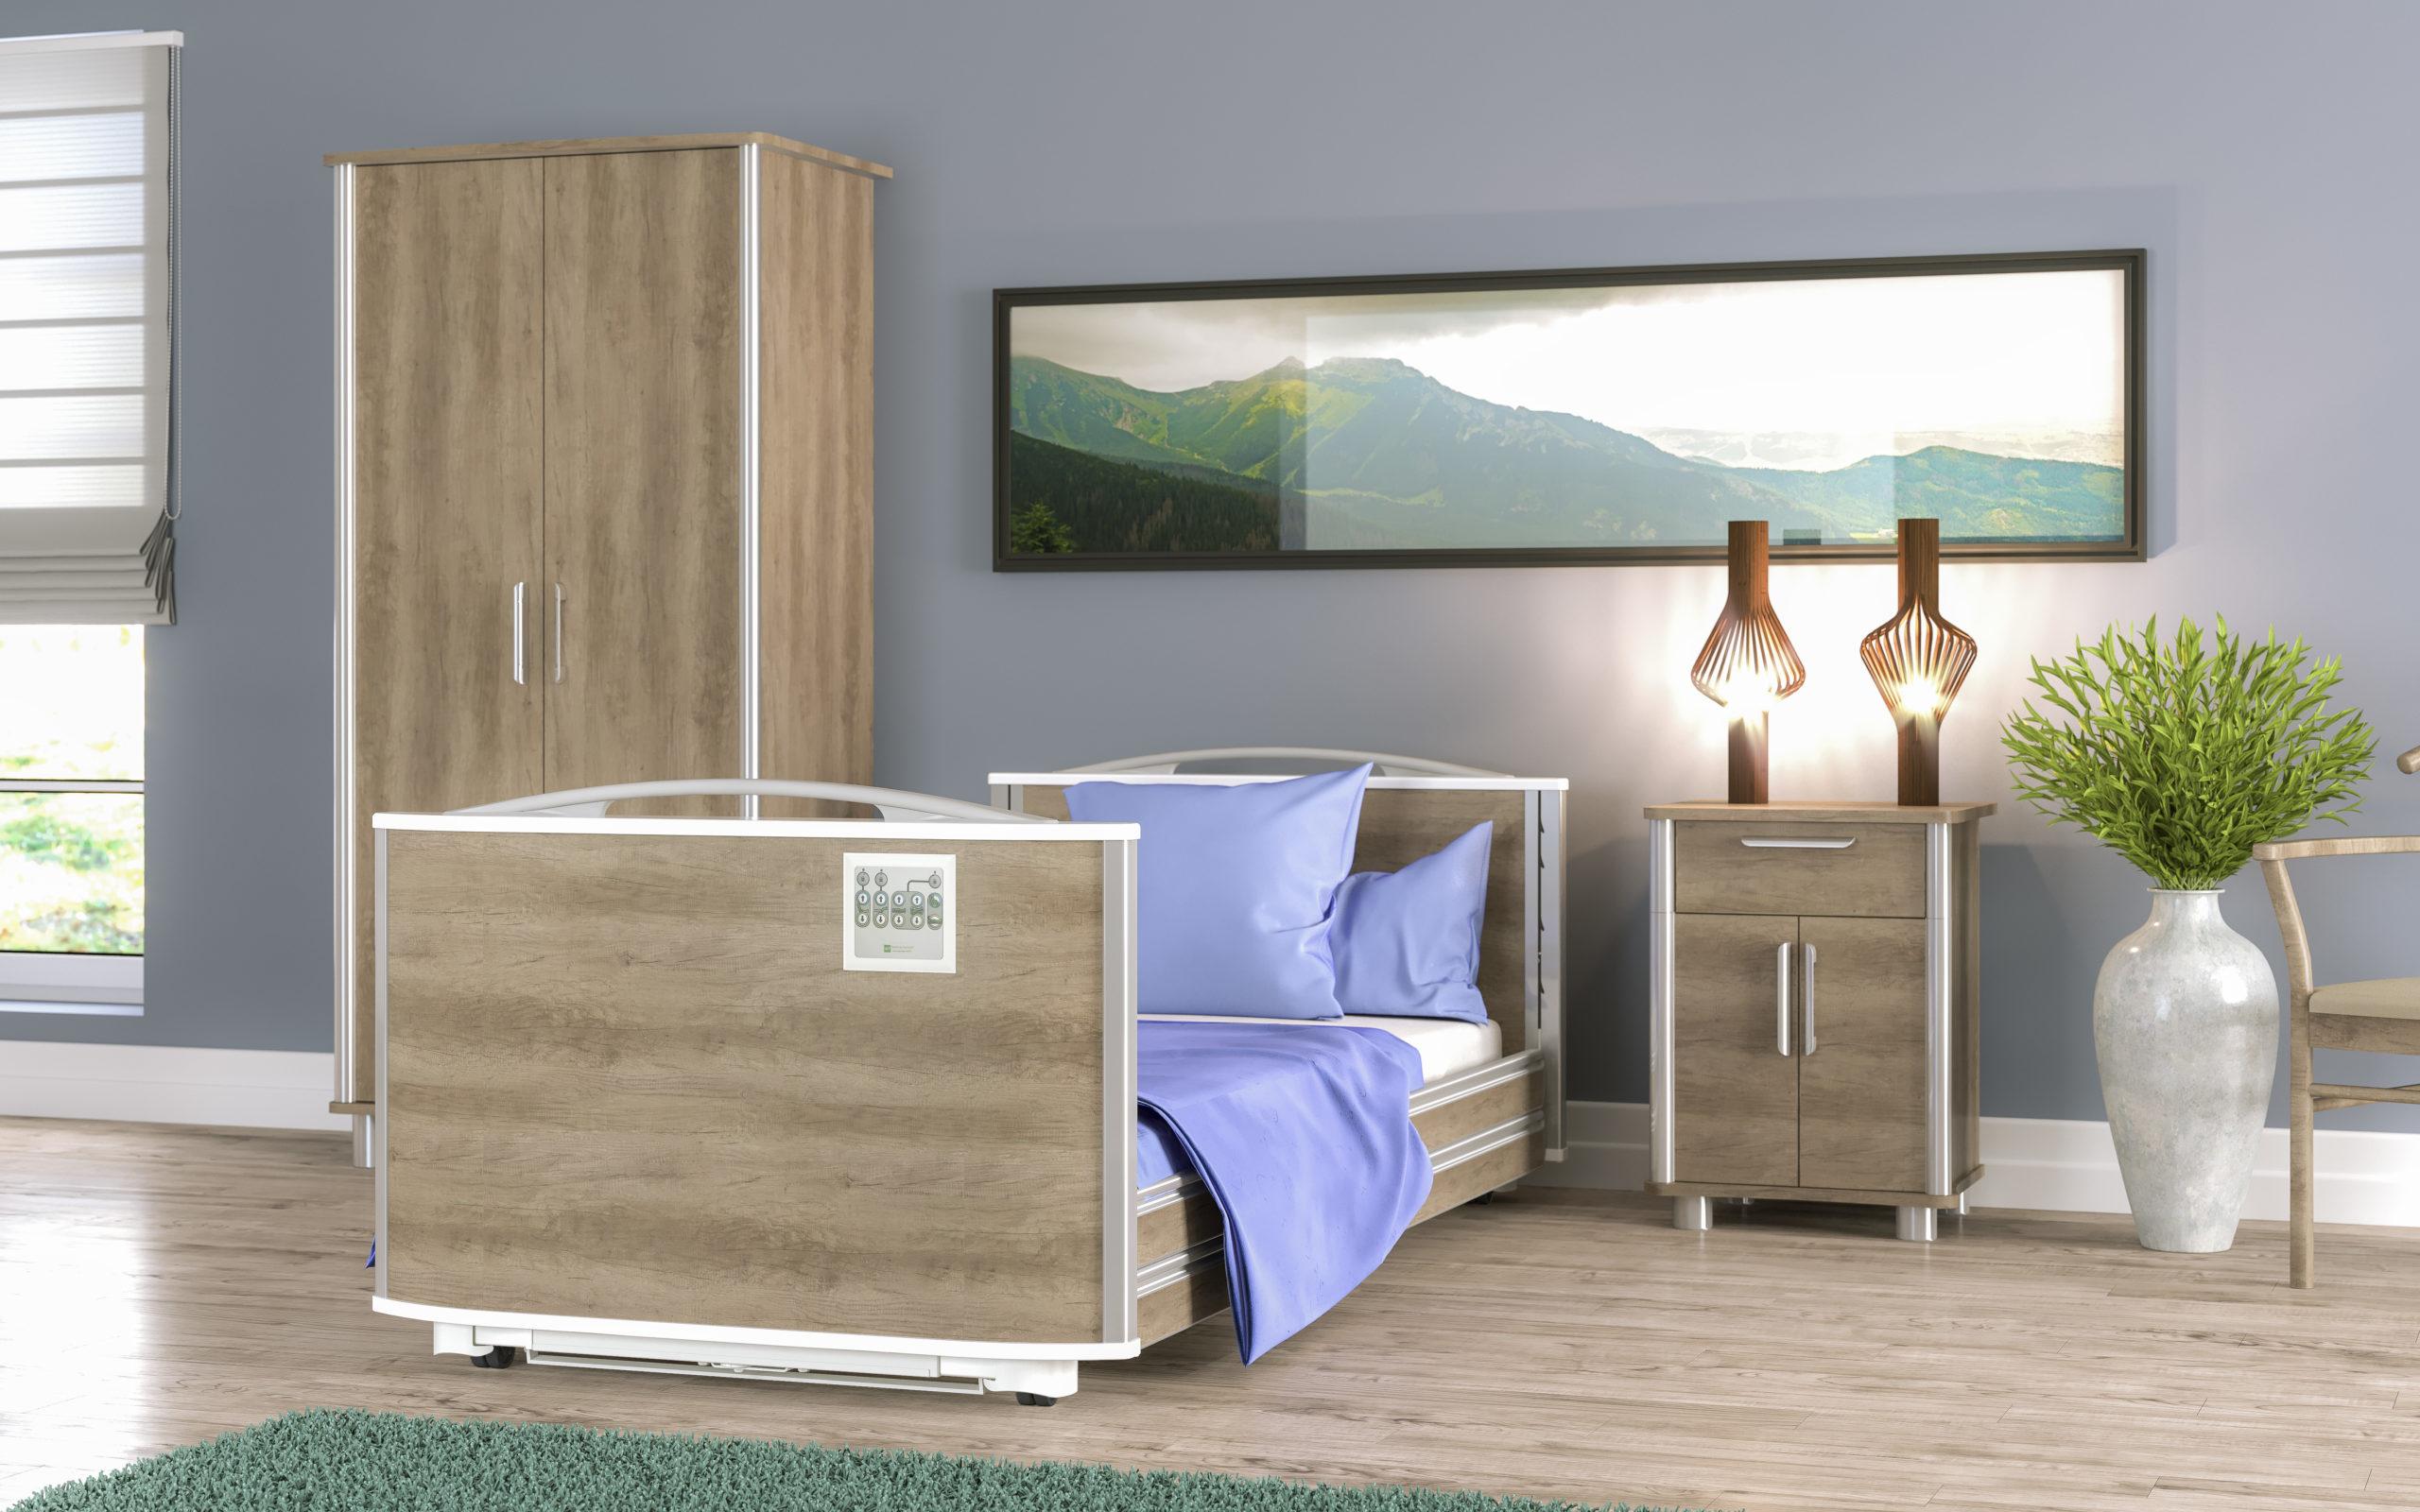 Floore Comfort nursing bed